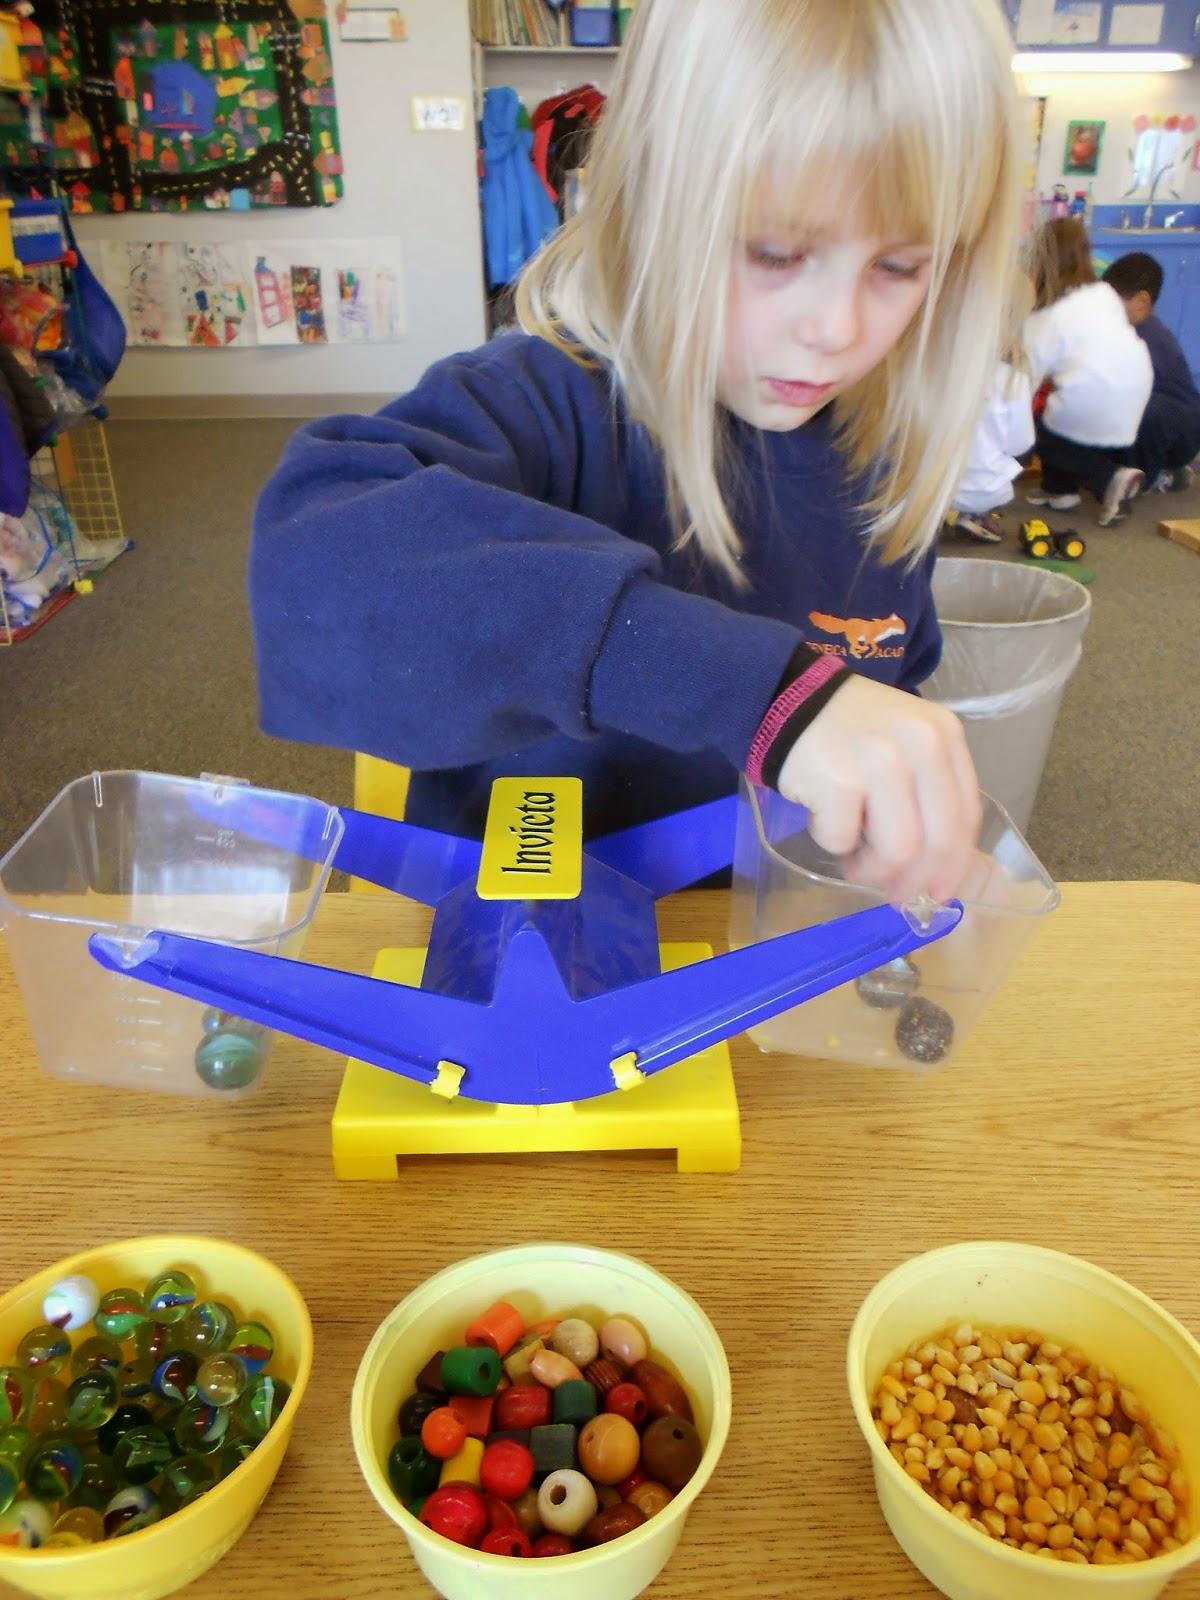 Private Kindergarten in MD